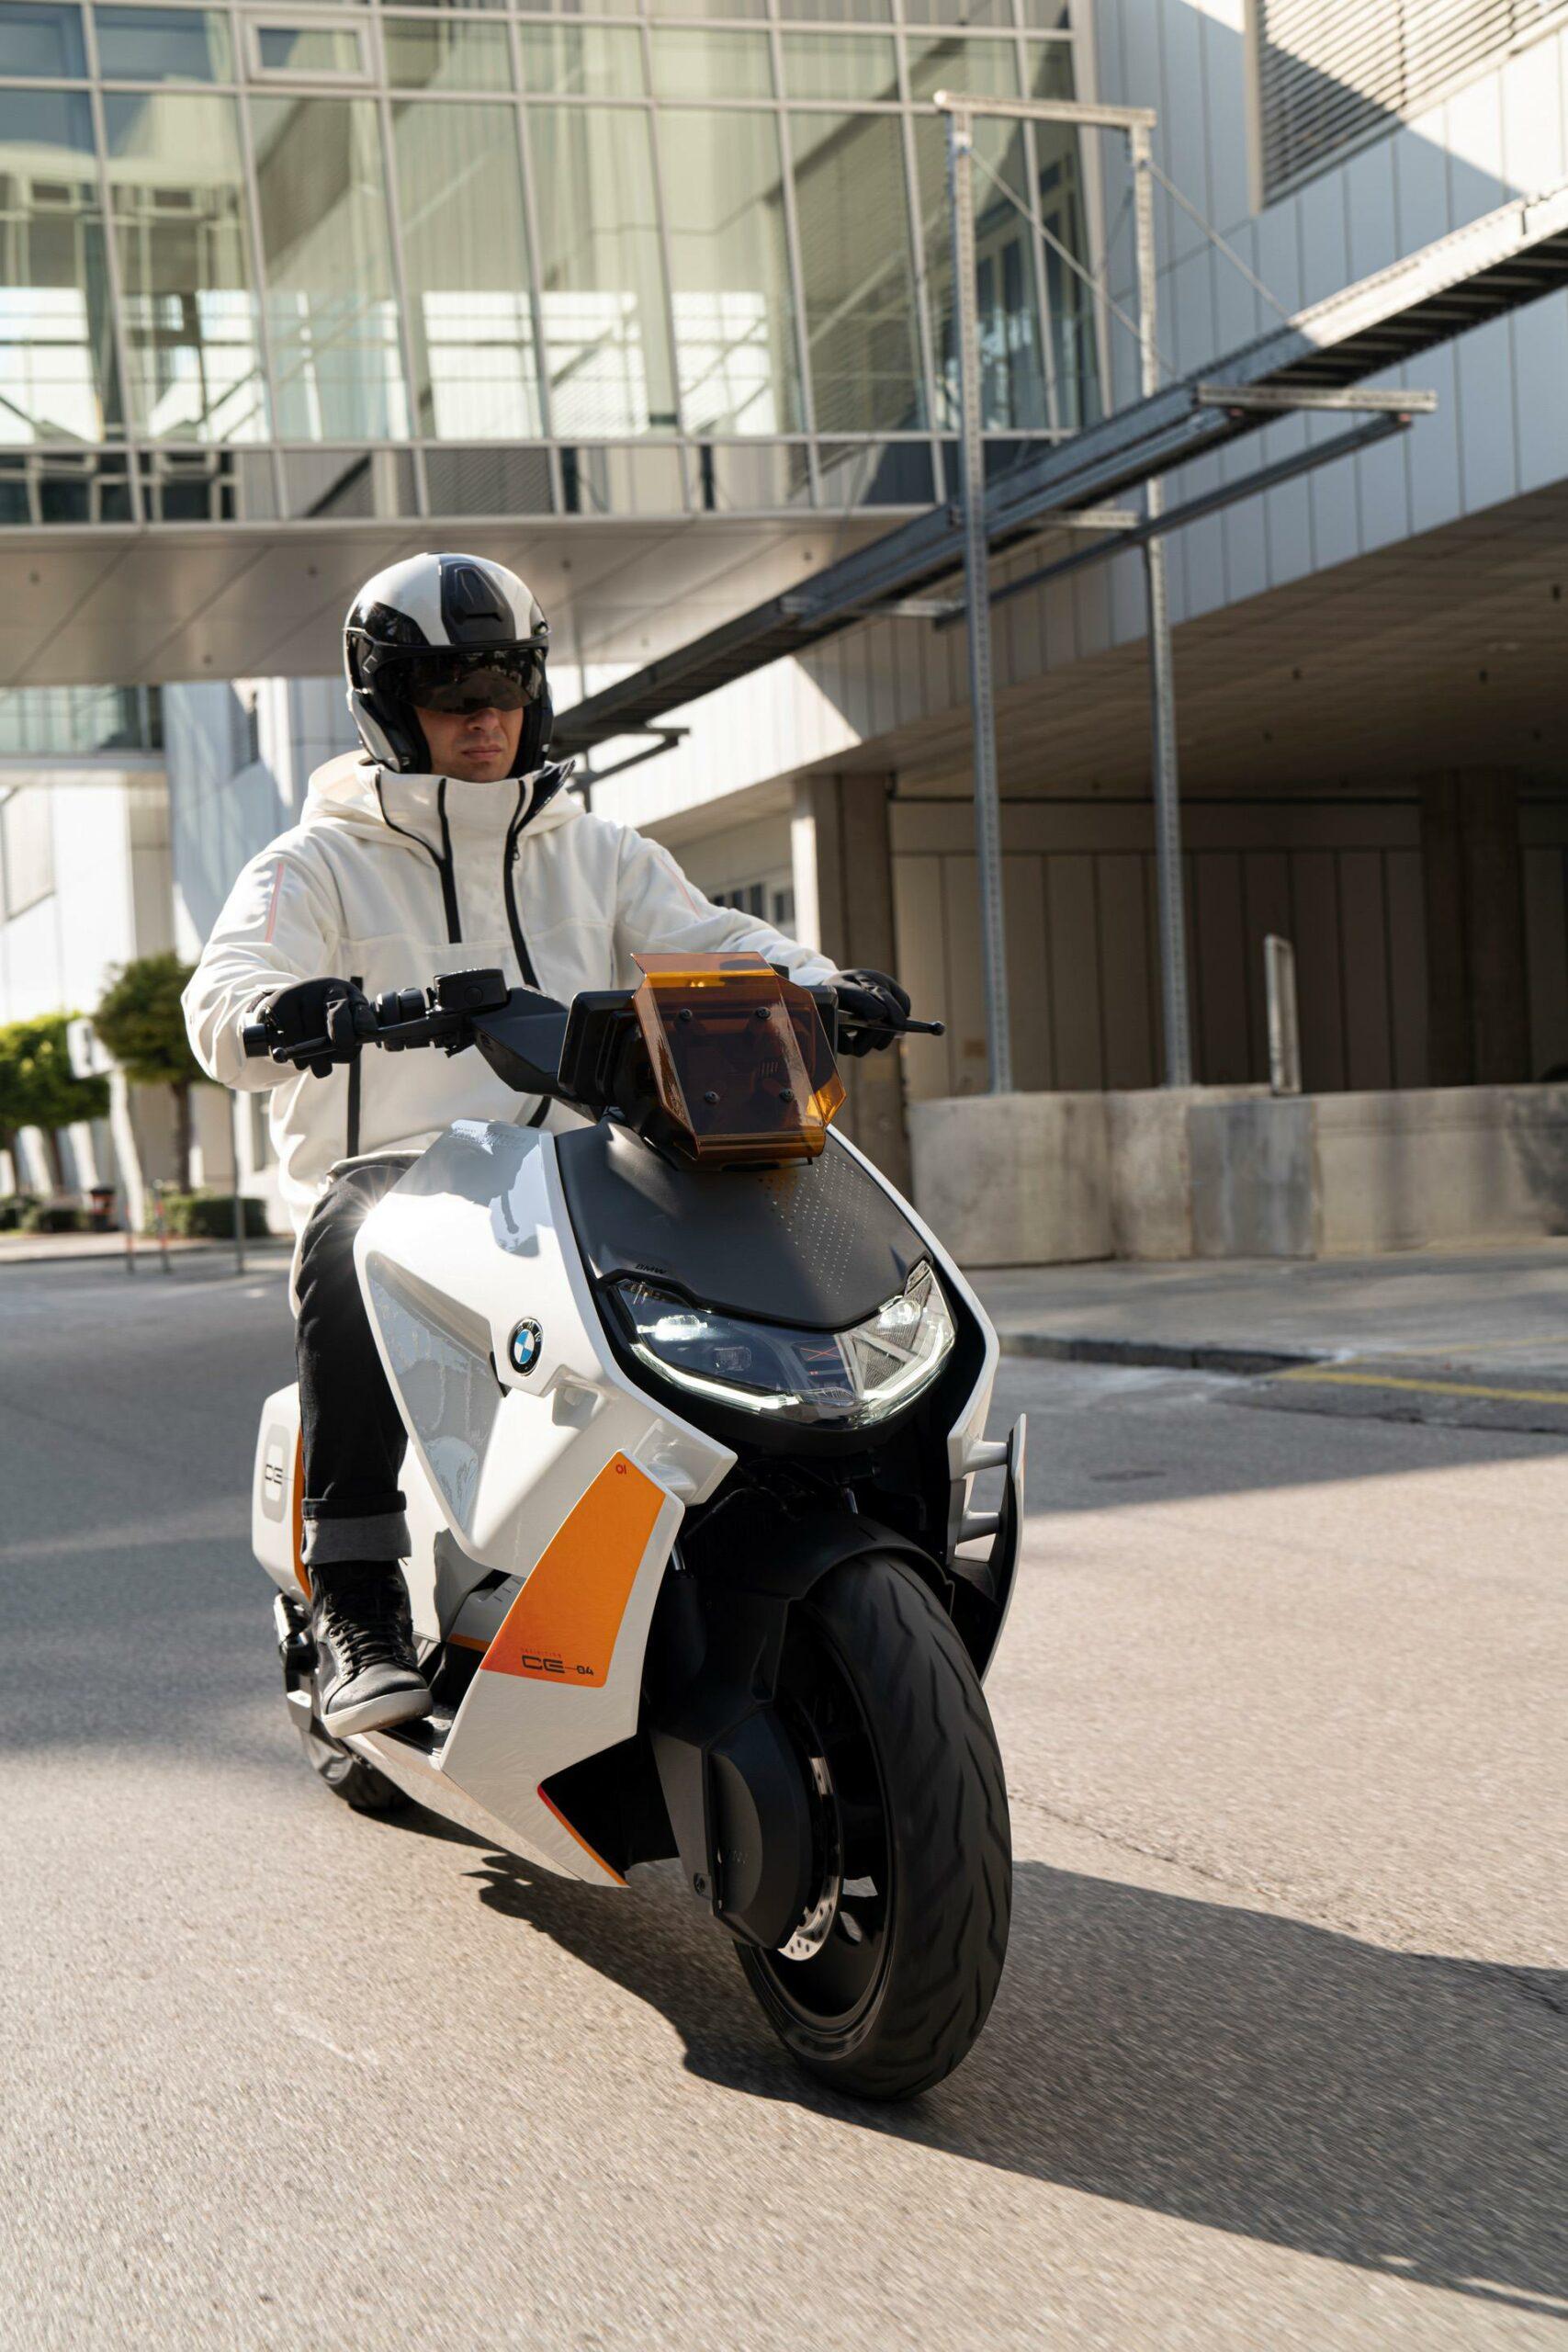 BMW Motorrad Definition CE 04 35 scaled